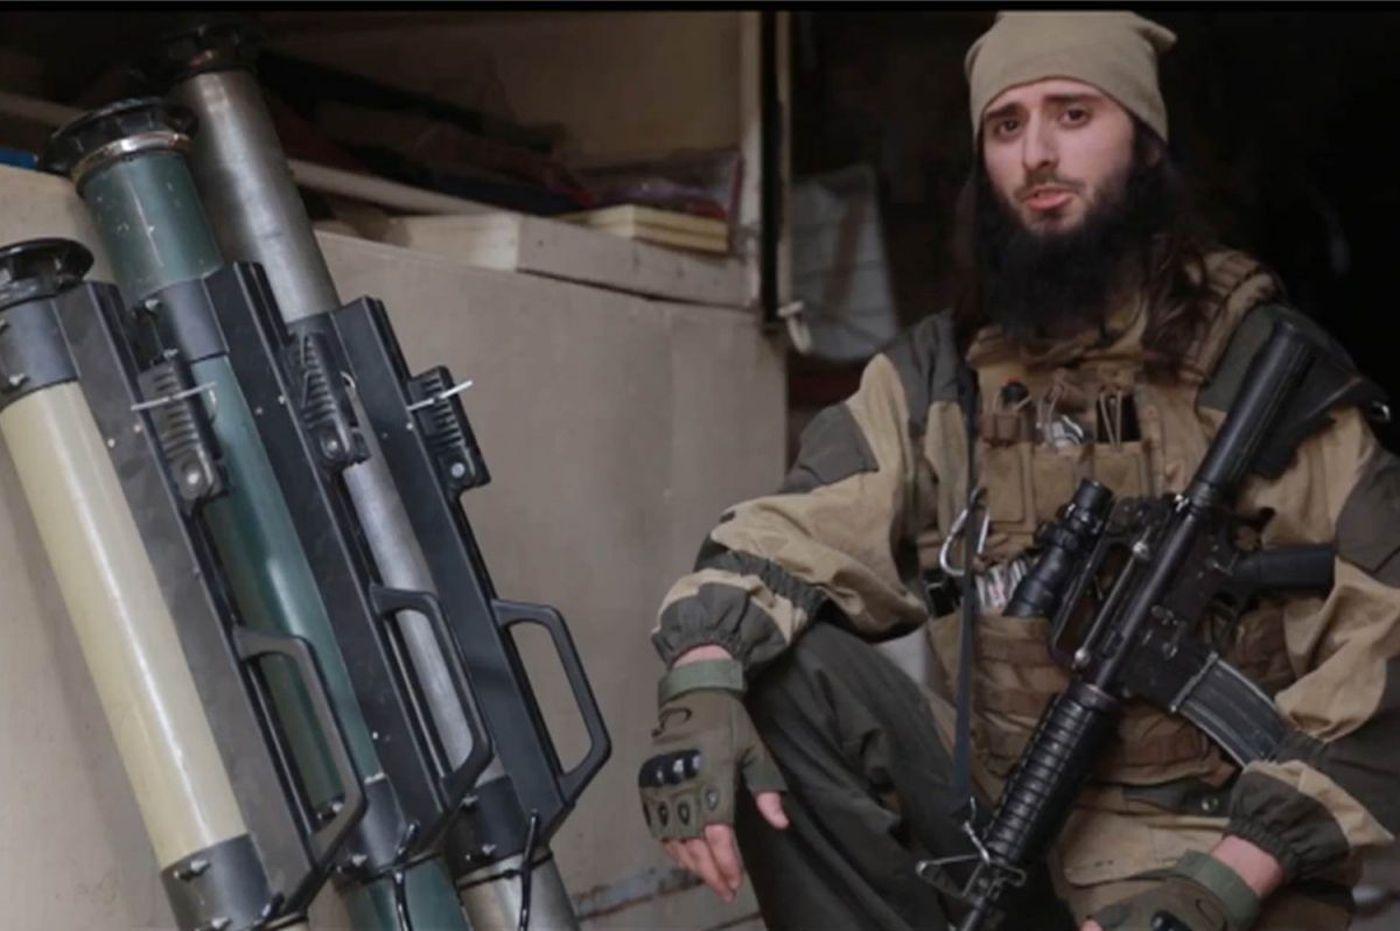 Atlantic City High School graduate identified as ISIS commander: report